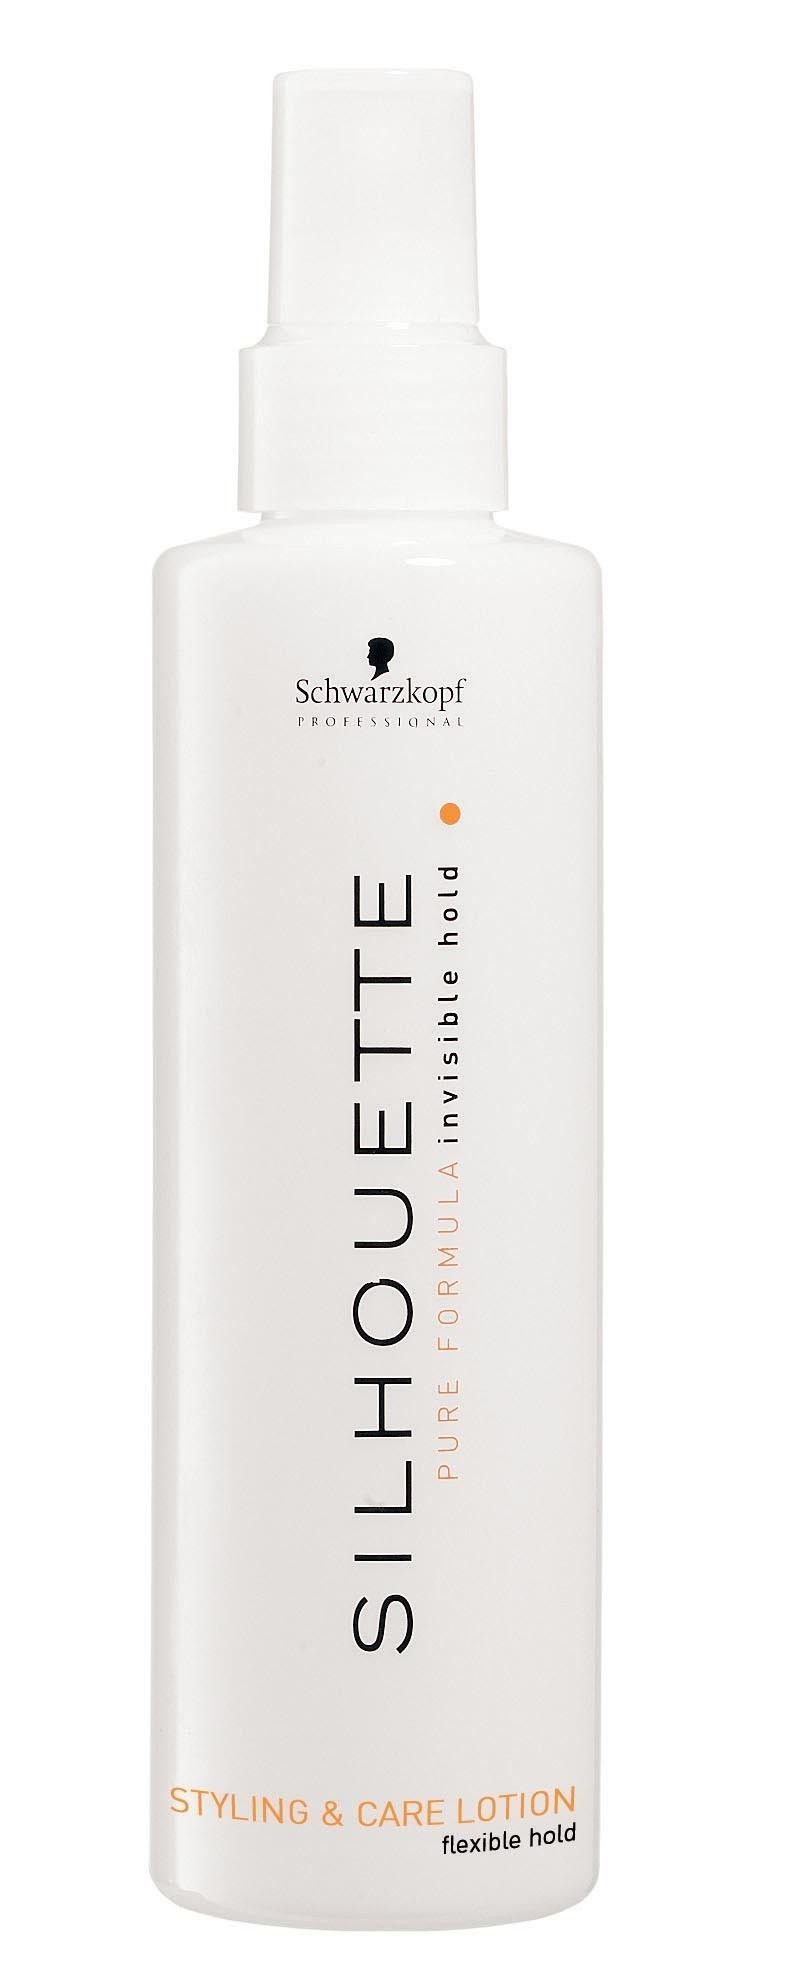 Schwarzkopf Silhouette Cosmetic 200ml